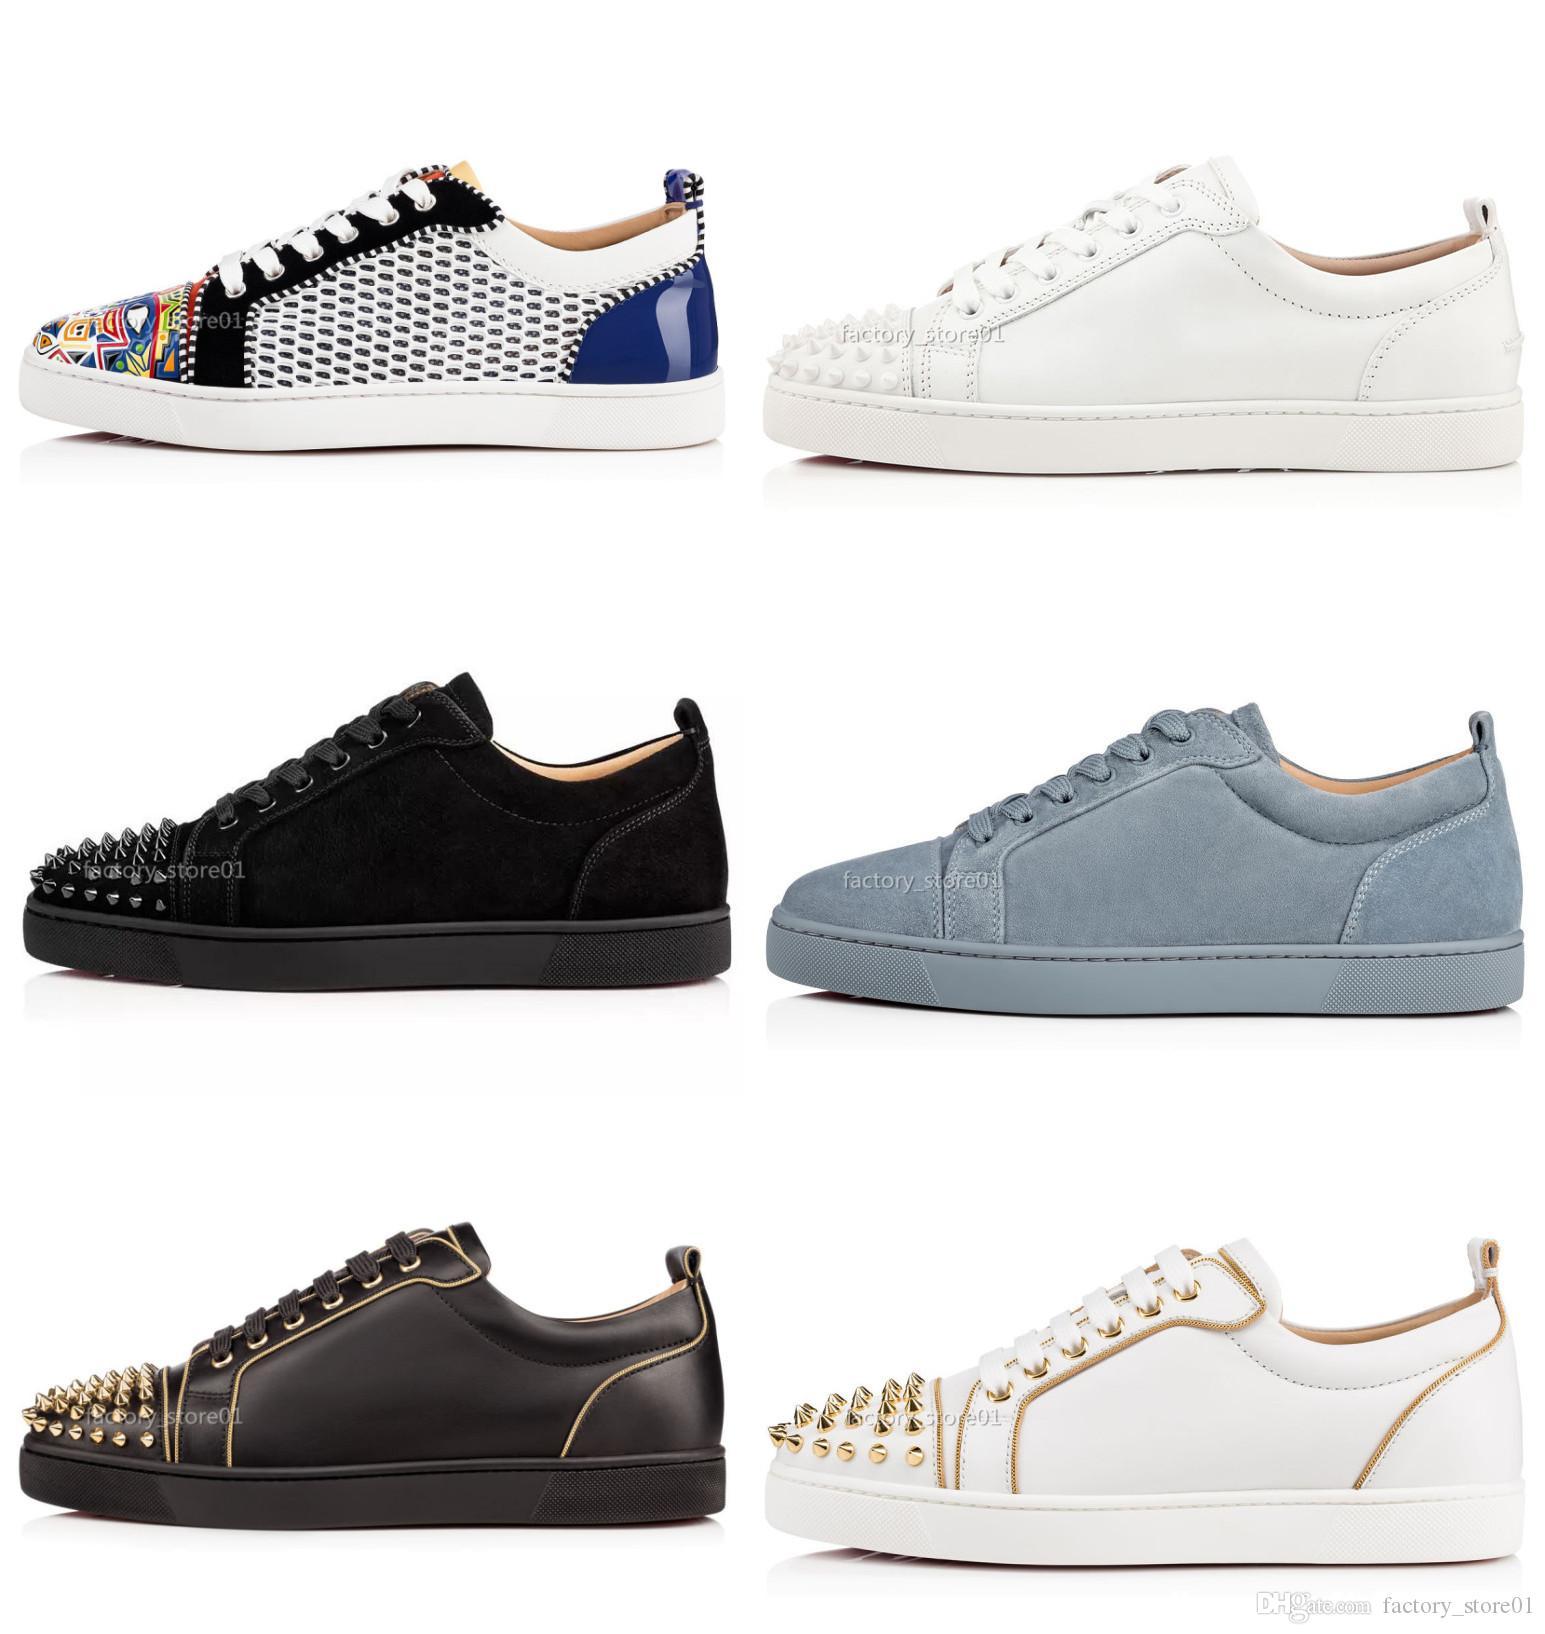 best designer sneakers womens